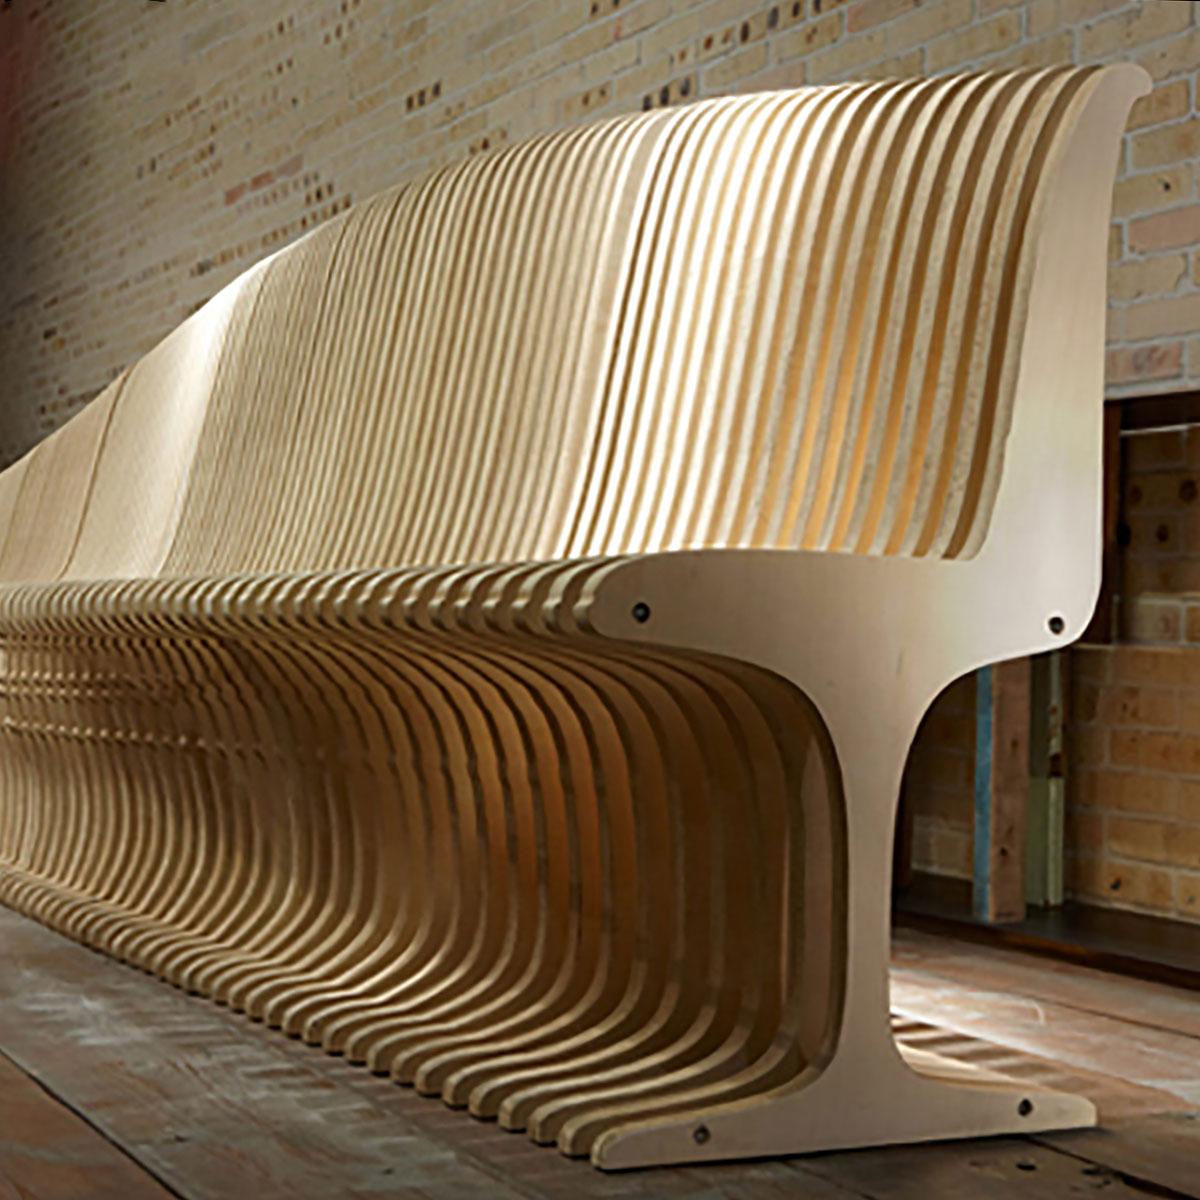 Morphing Furniture | noiz architects